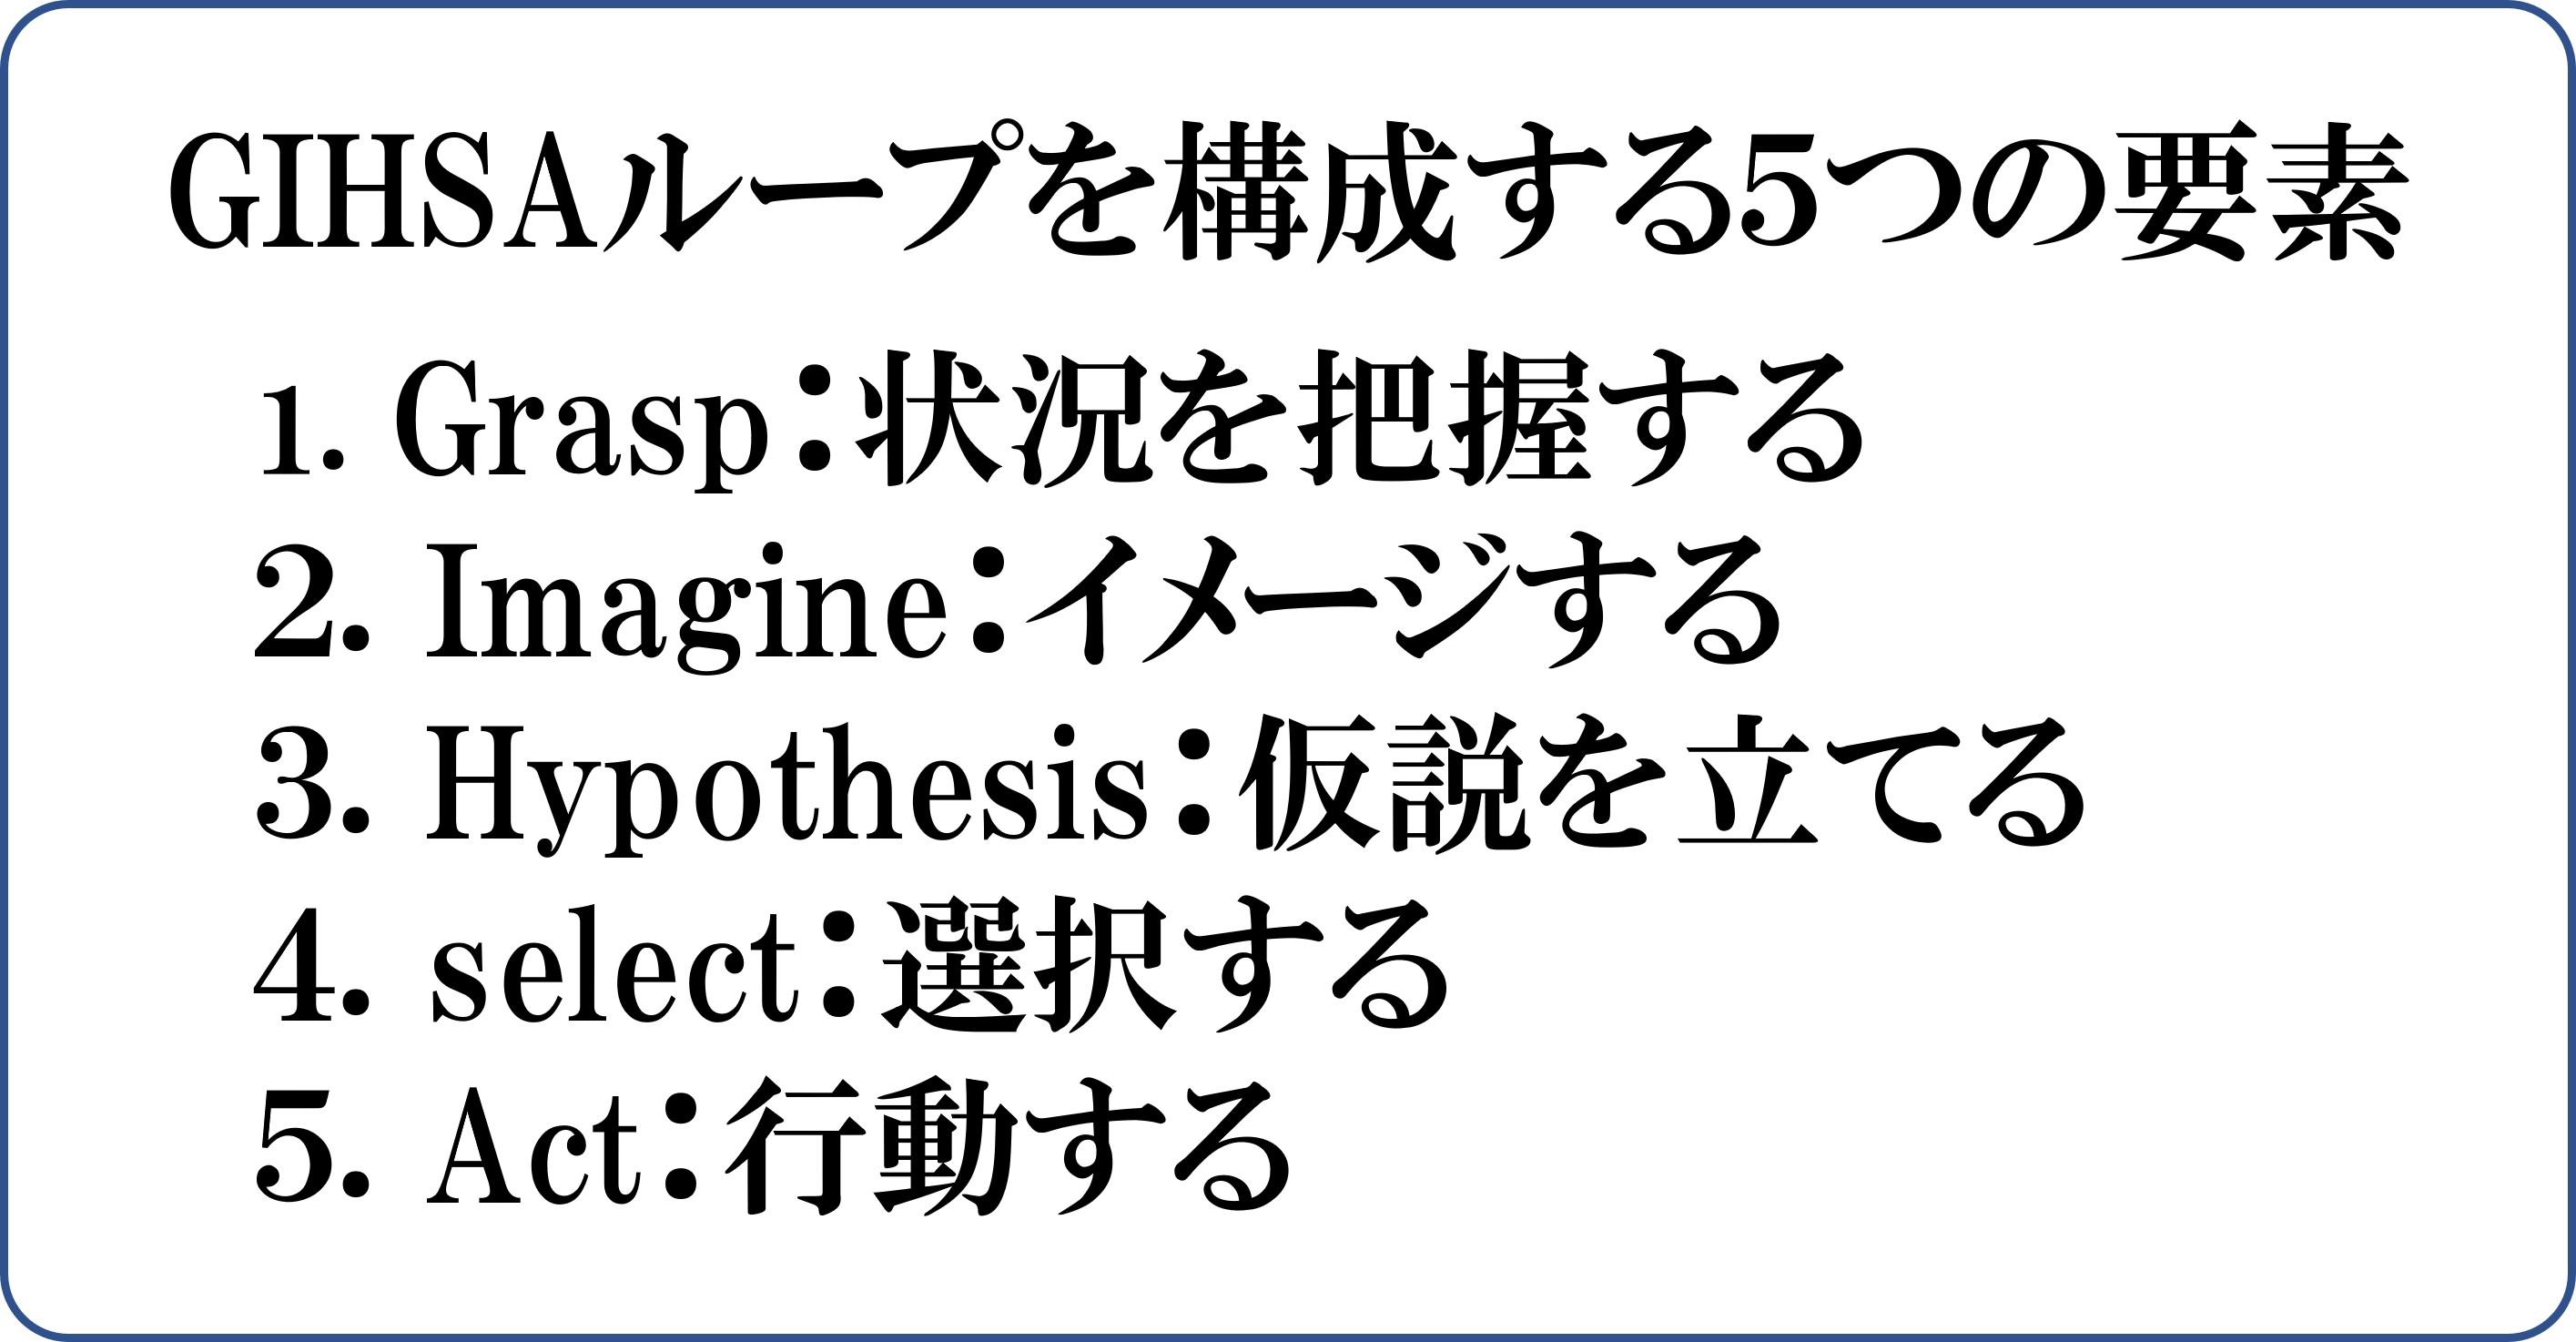 GIHSAループを構成する5つの要素 Grasp:状況を把握する 2. Imagine:イメージする 3. Hypothesis:仮説を立てる 4. select:選択する 5. Act:行動する